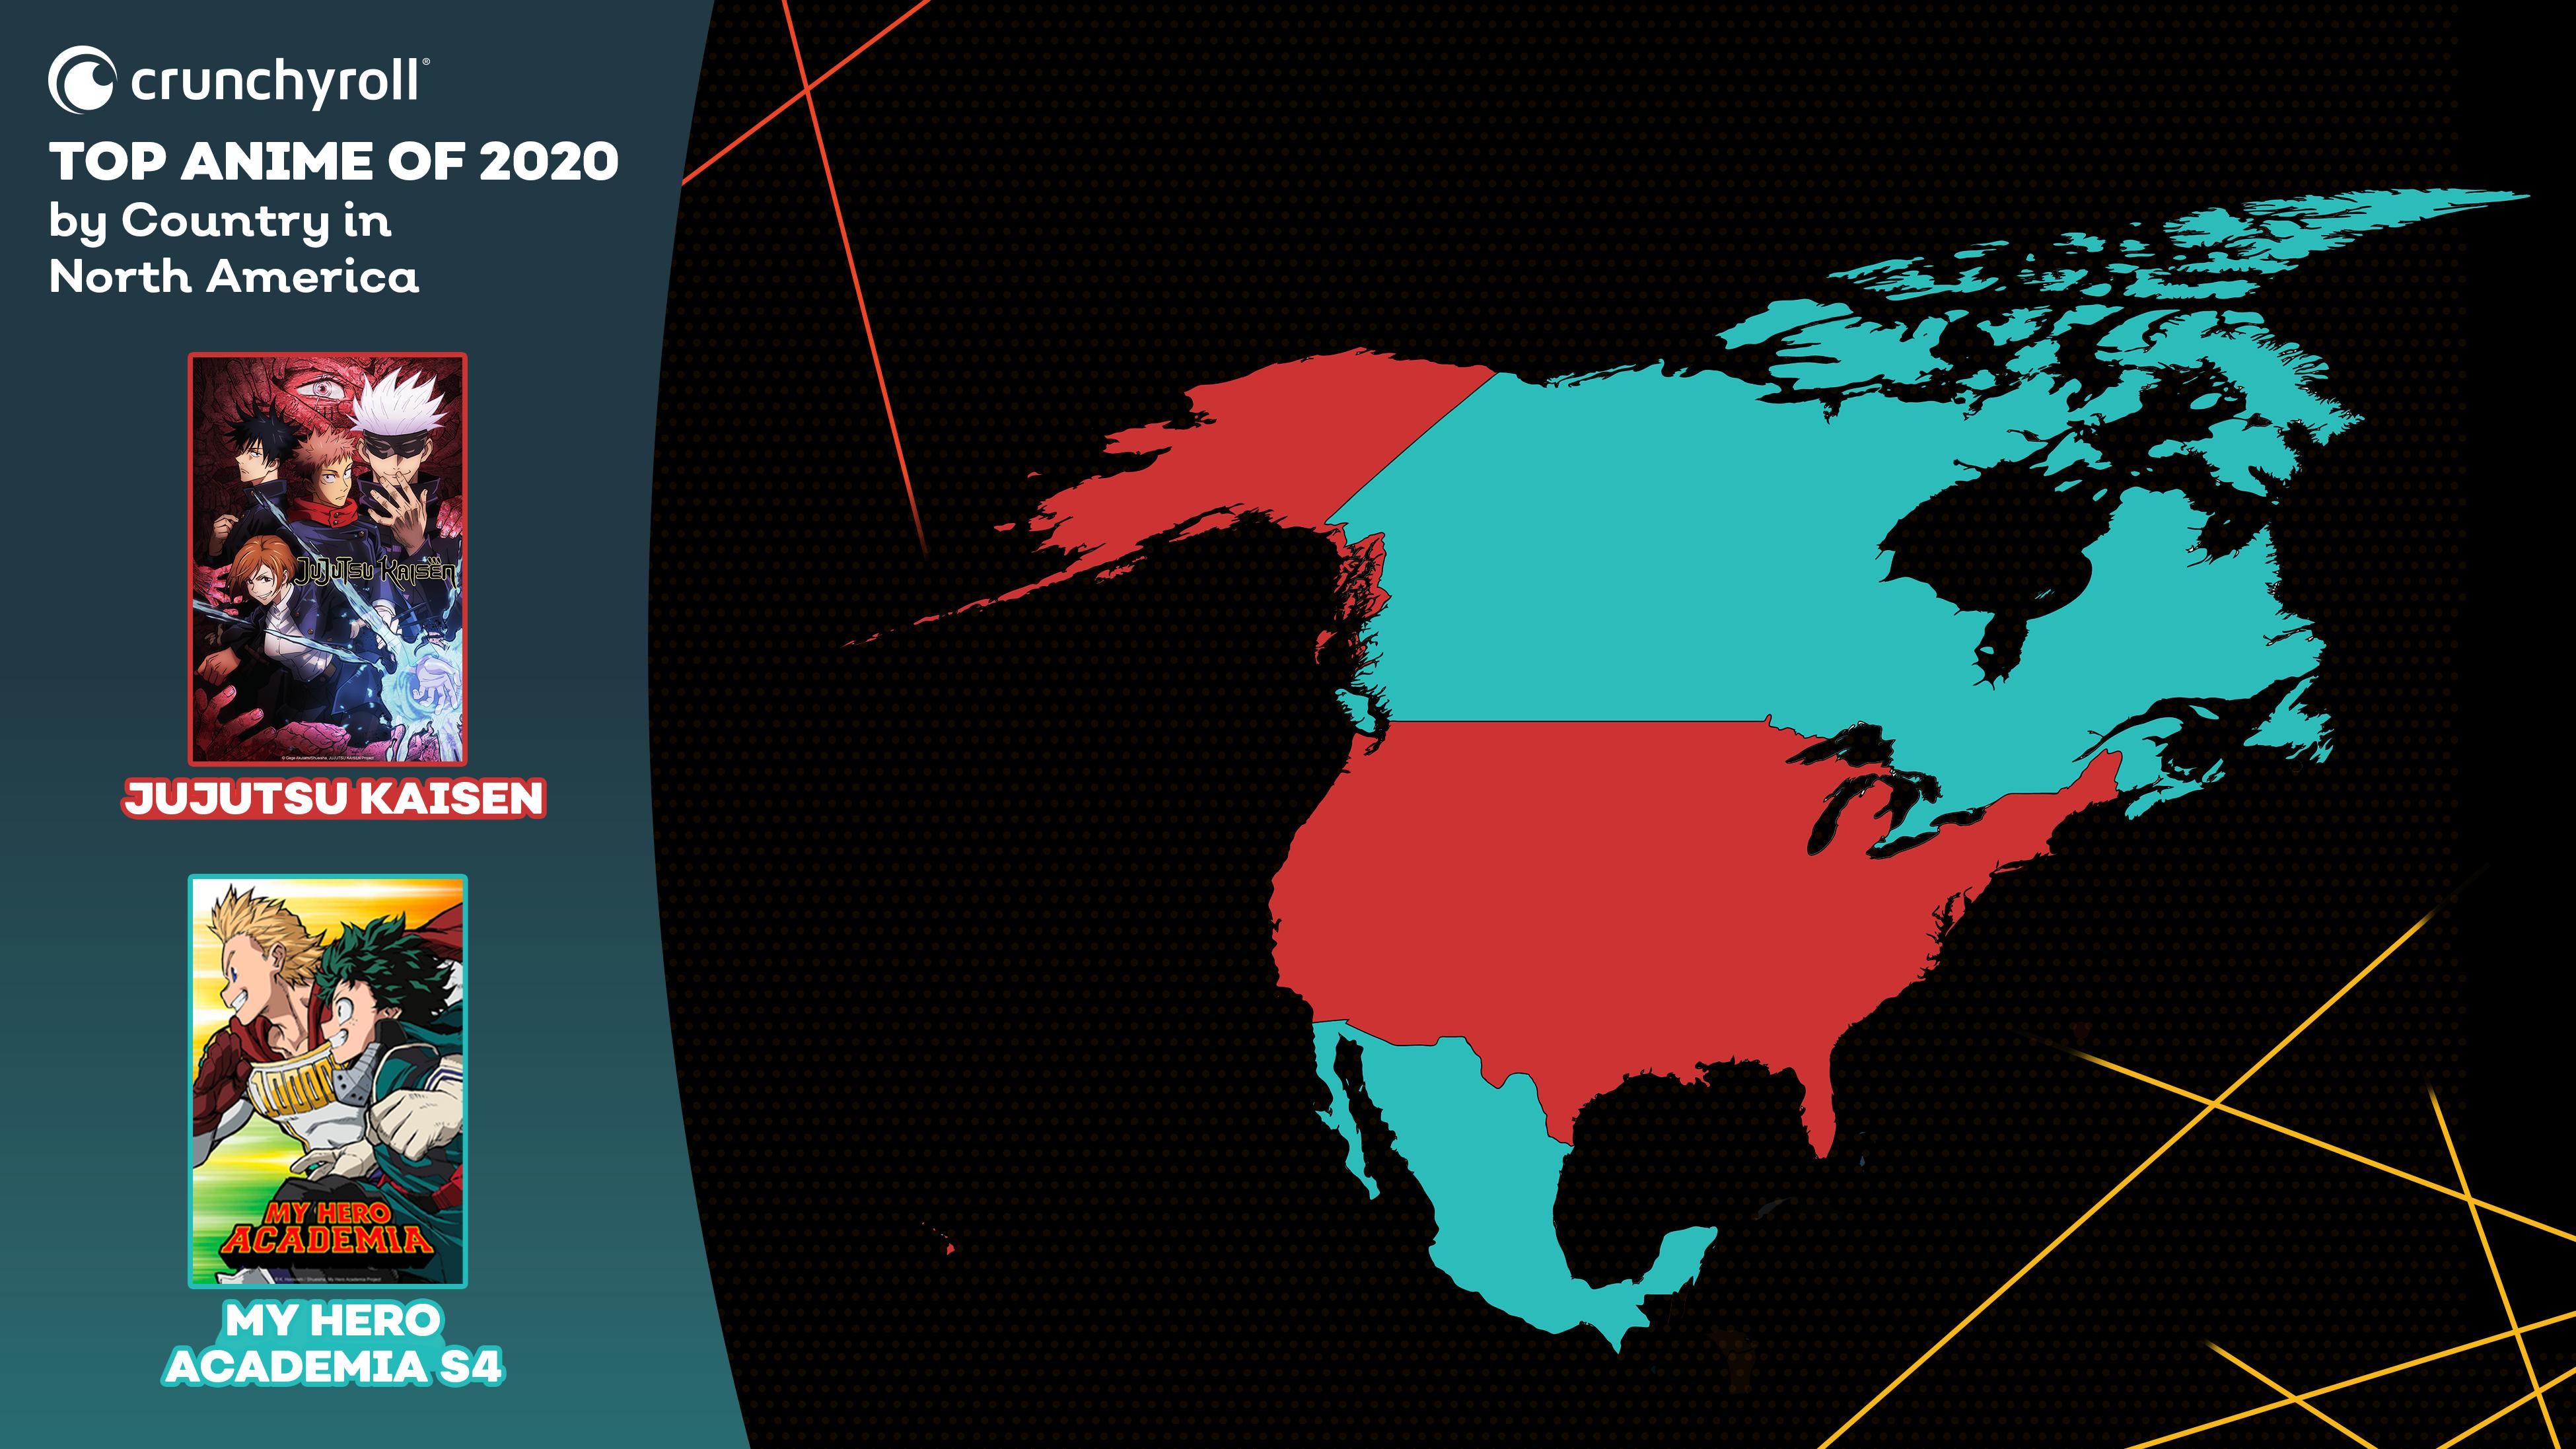 Mejor anime de 2020 por país: América del Norte